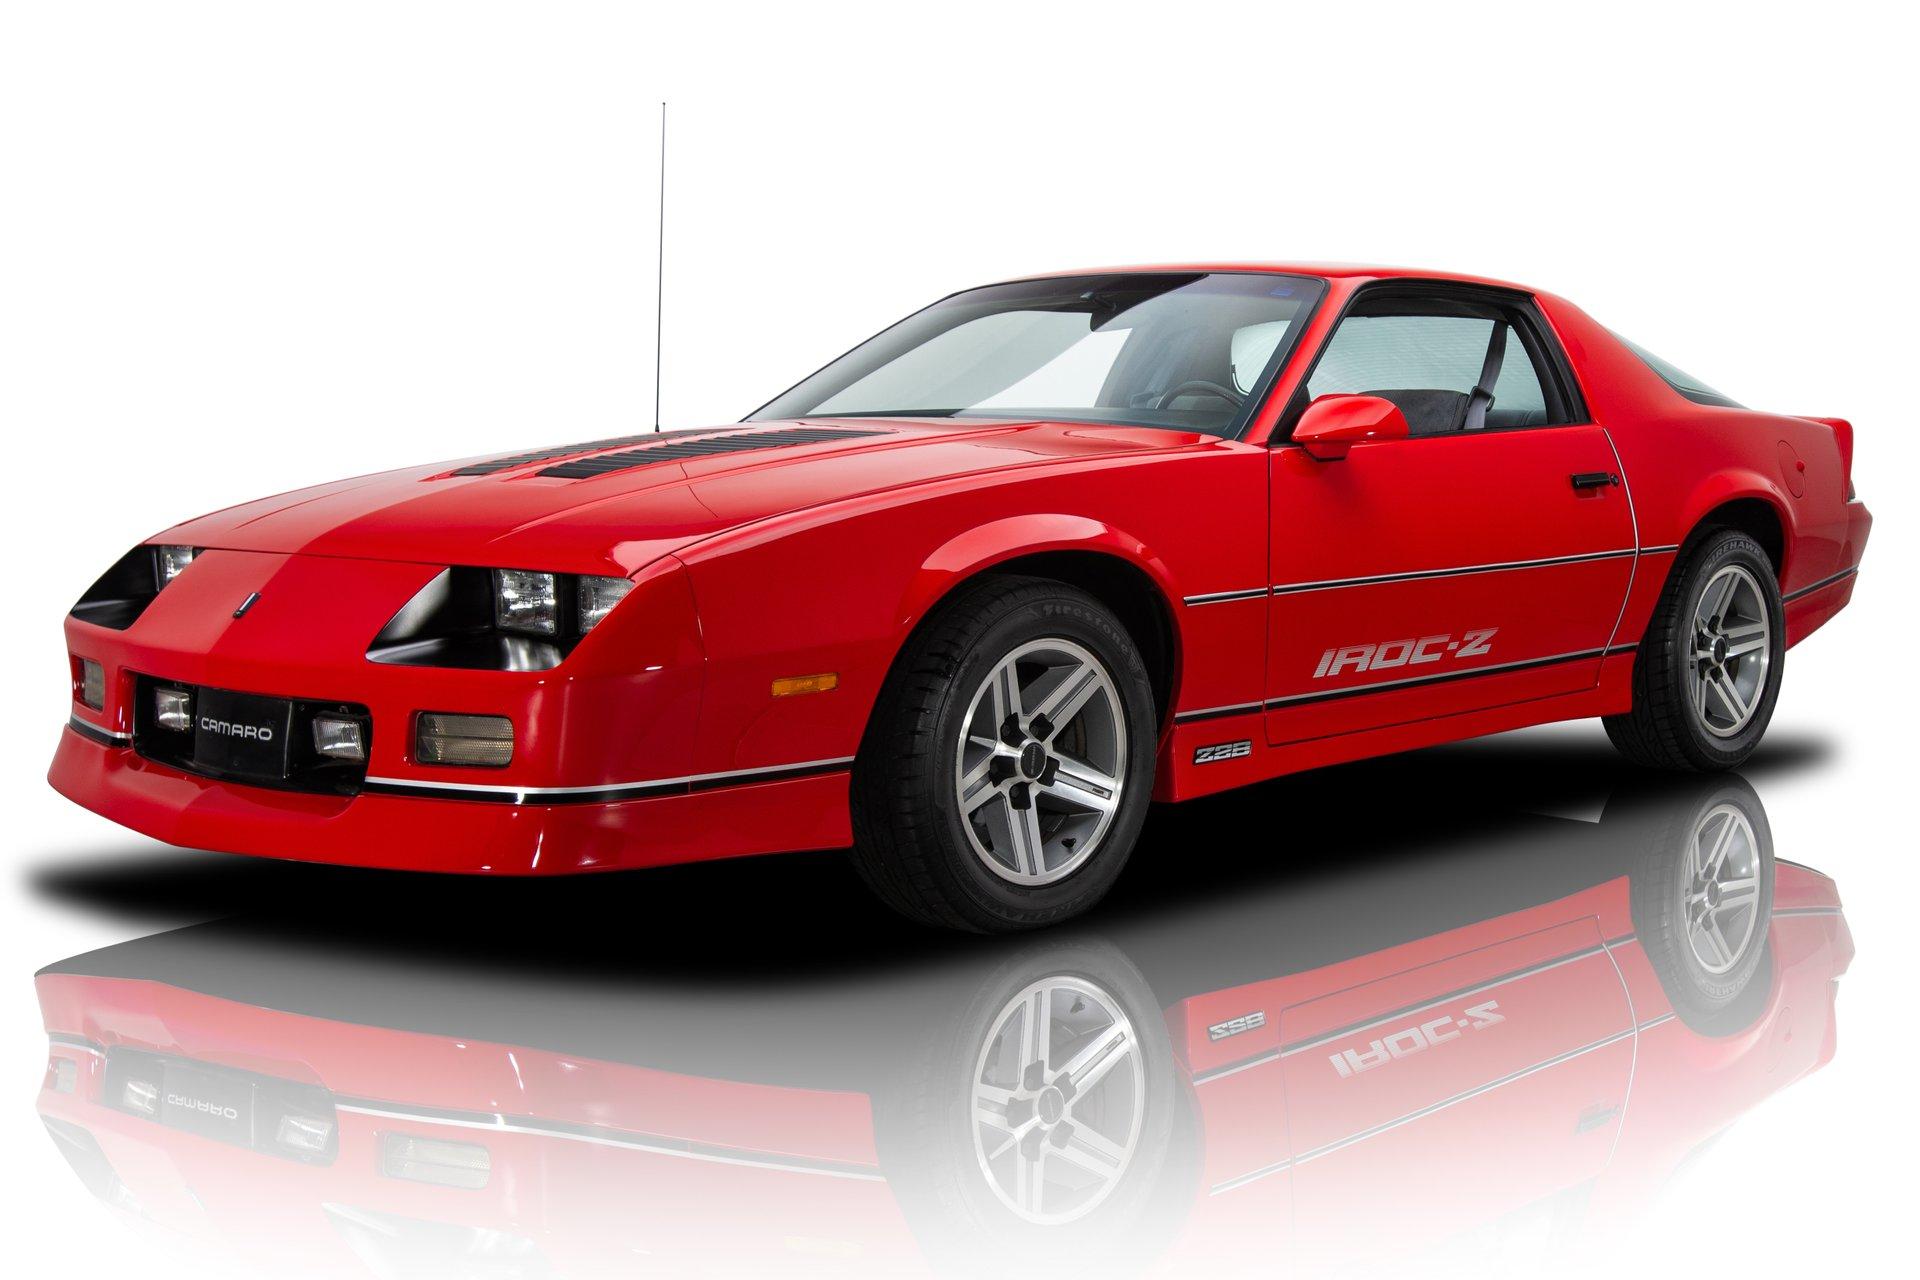 136212 1986 Chevrolet Camaro Rk Motors Classic Cars For Sale